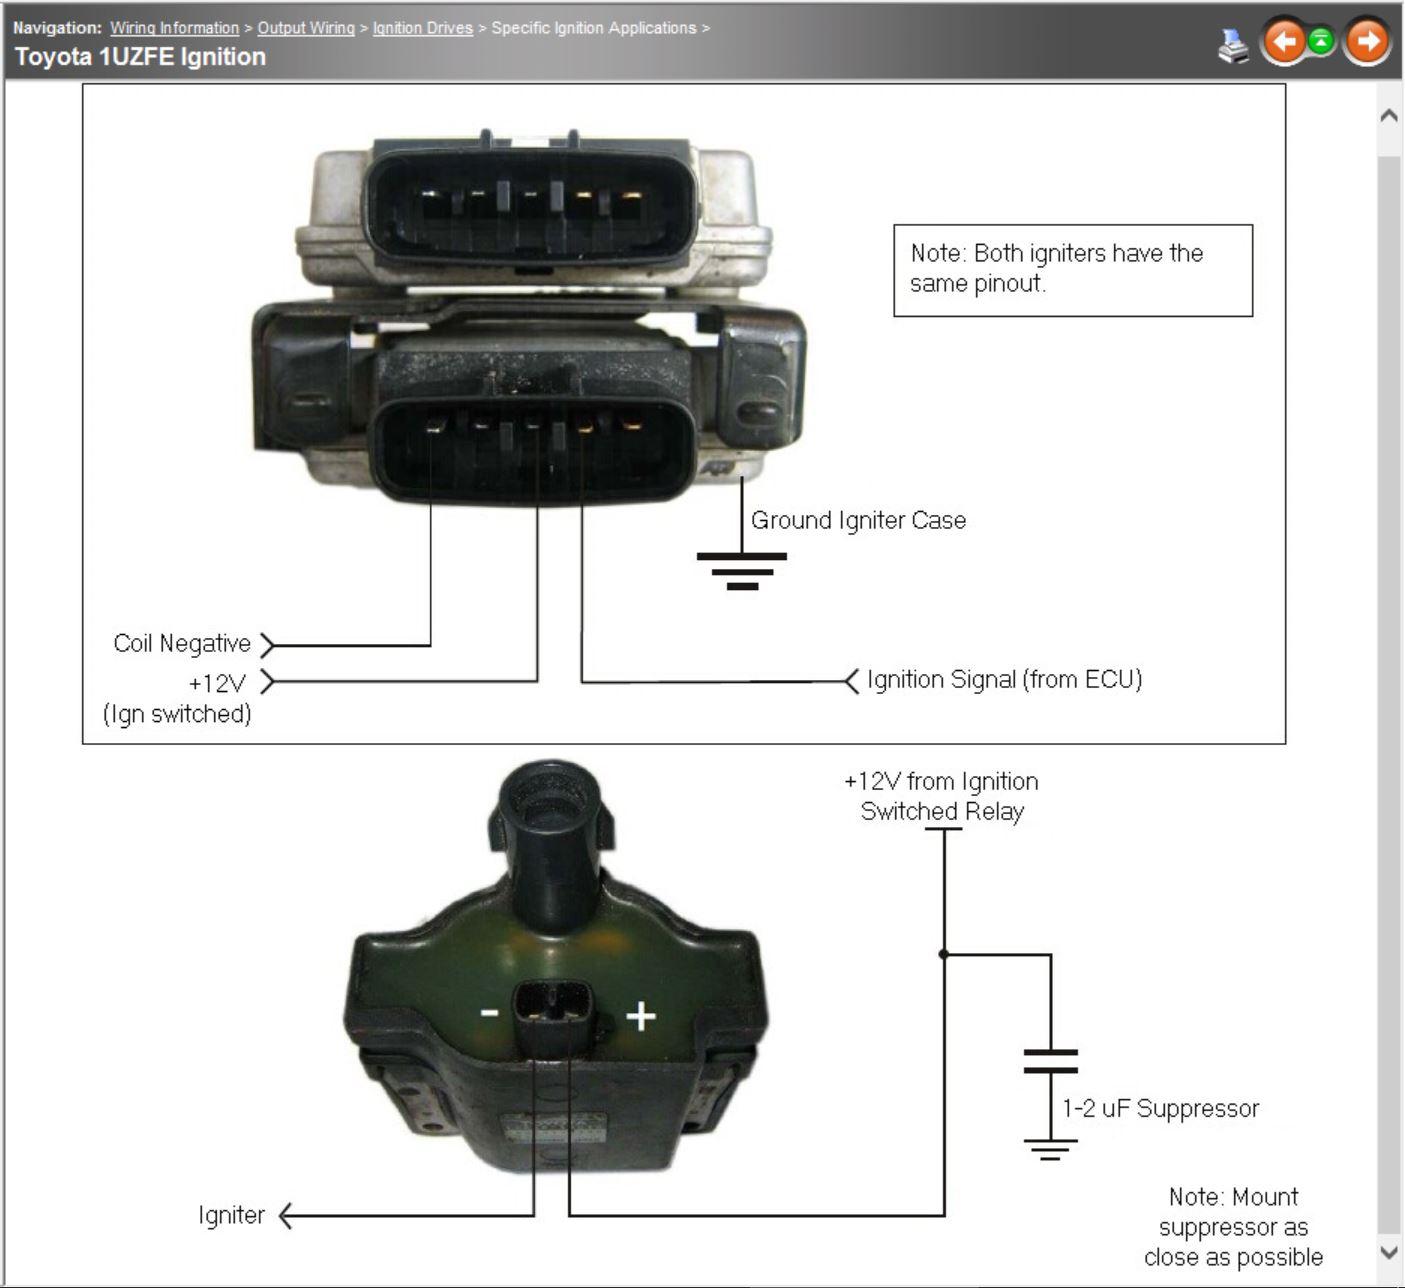 Admirable Toyota Igniter Wiring Diagram Wirings Diagram Wiring Database Mangnorabwedabyuccorg